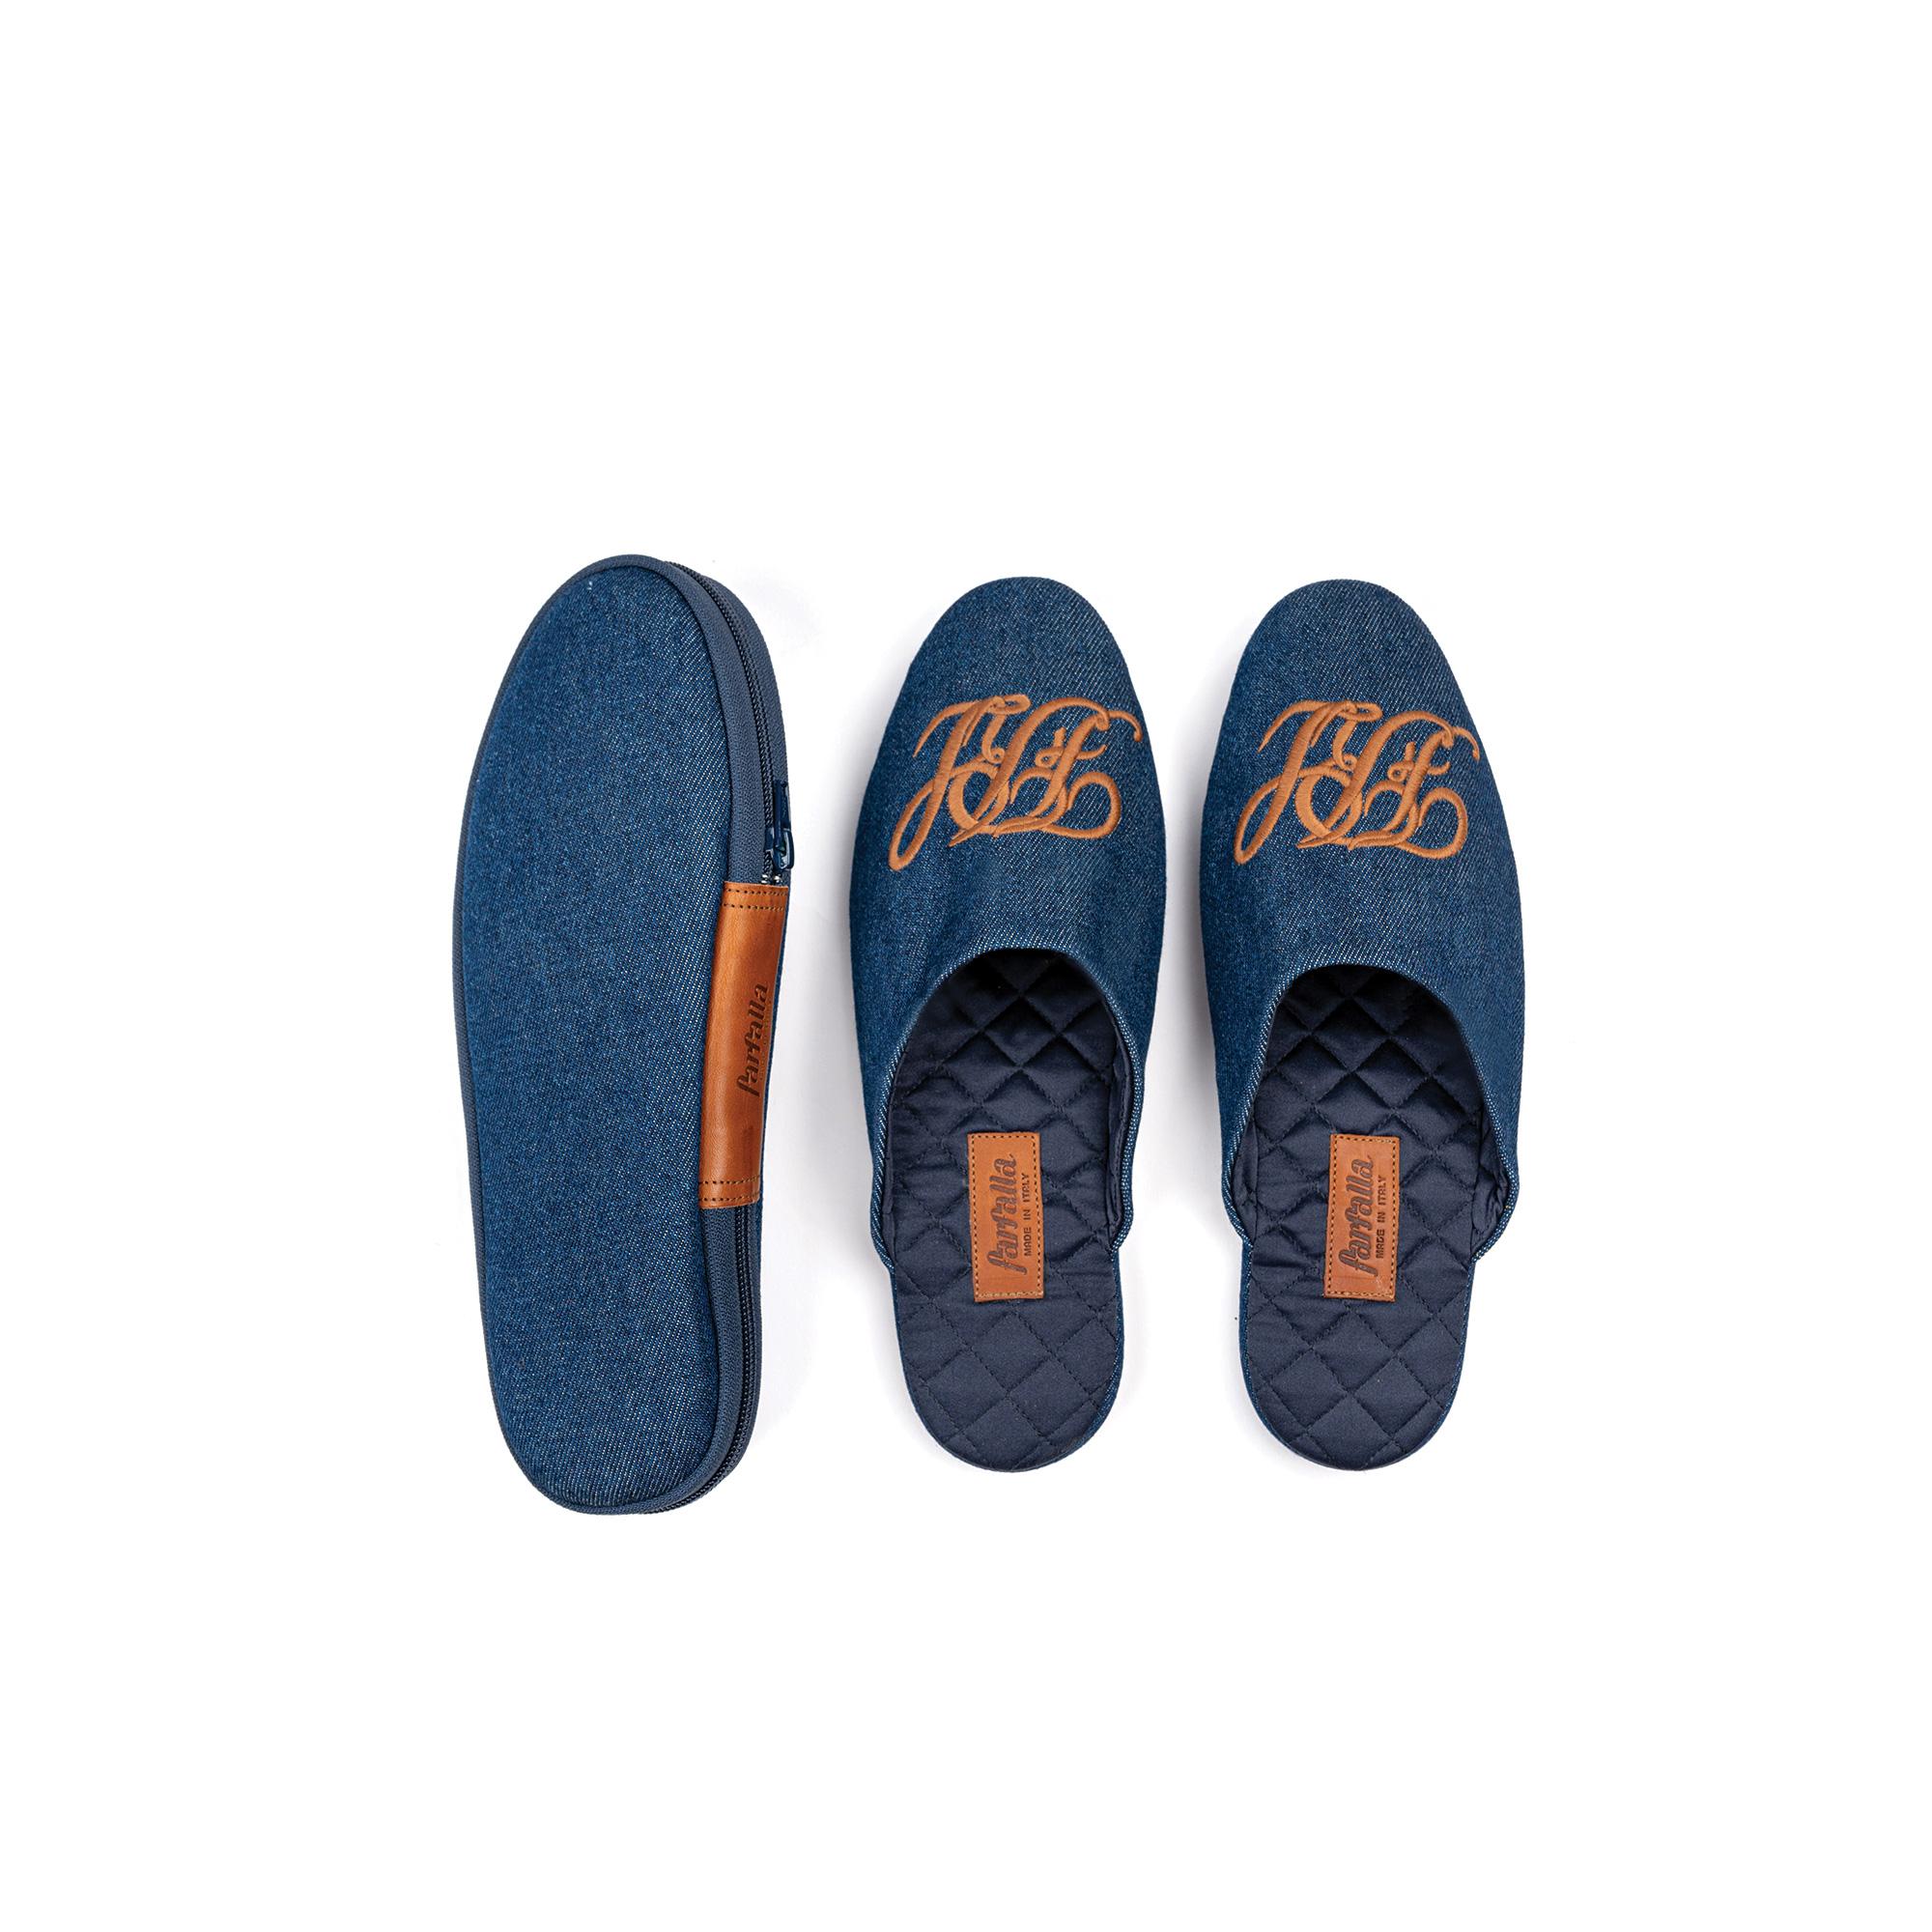 Indoor classic slipper in denim - Farfalla italian slippers